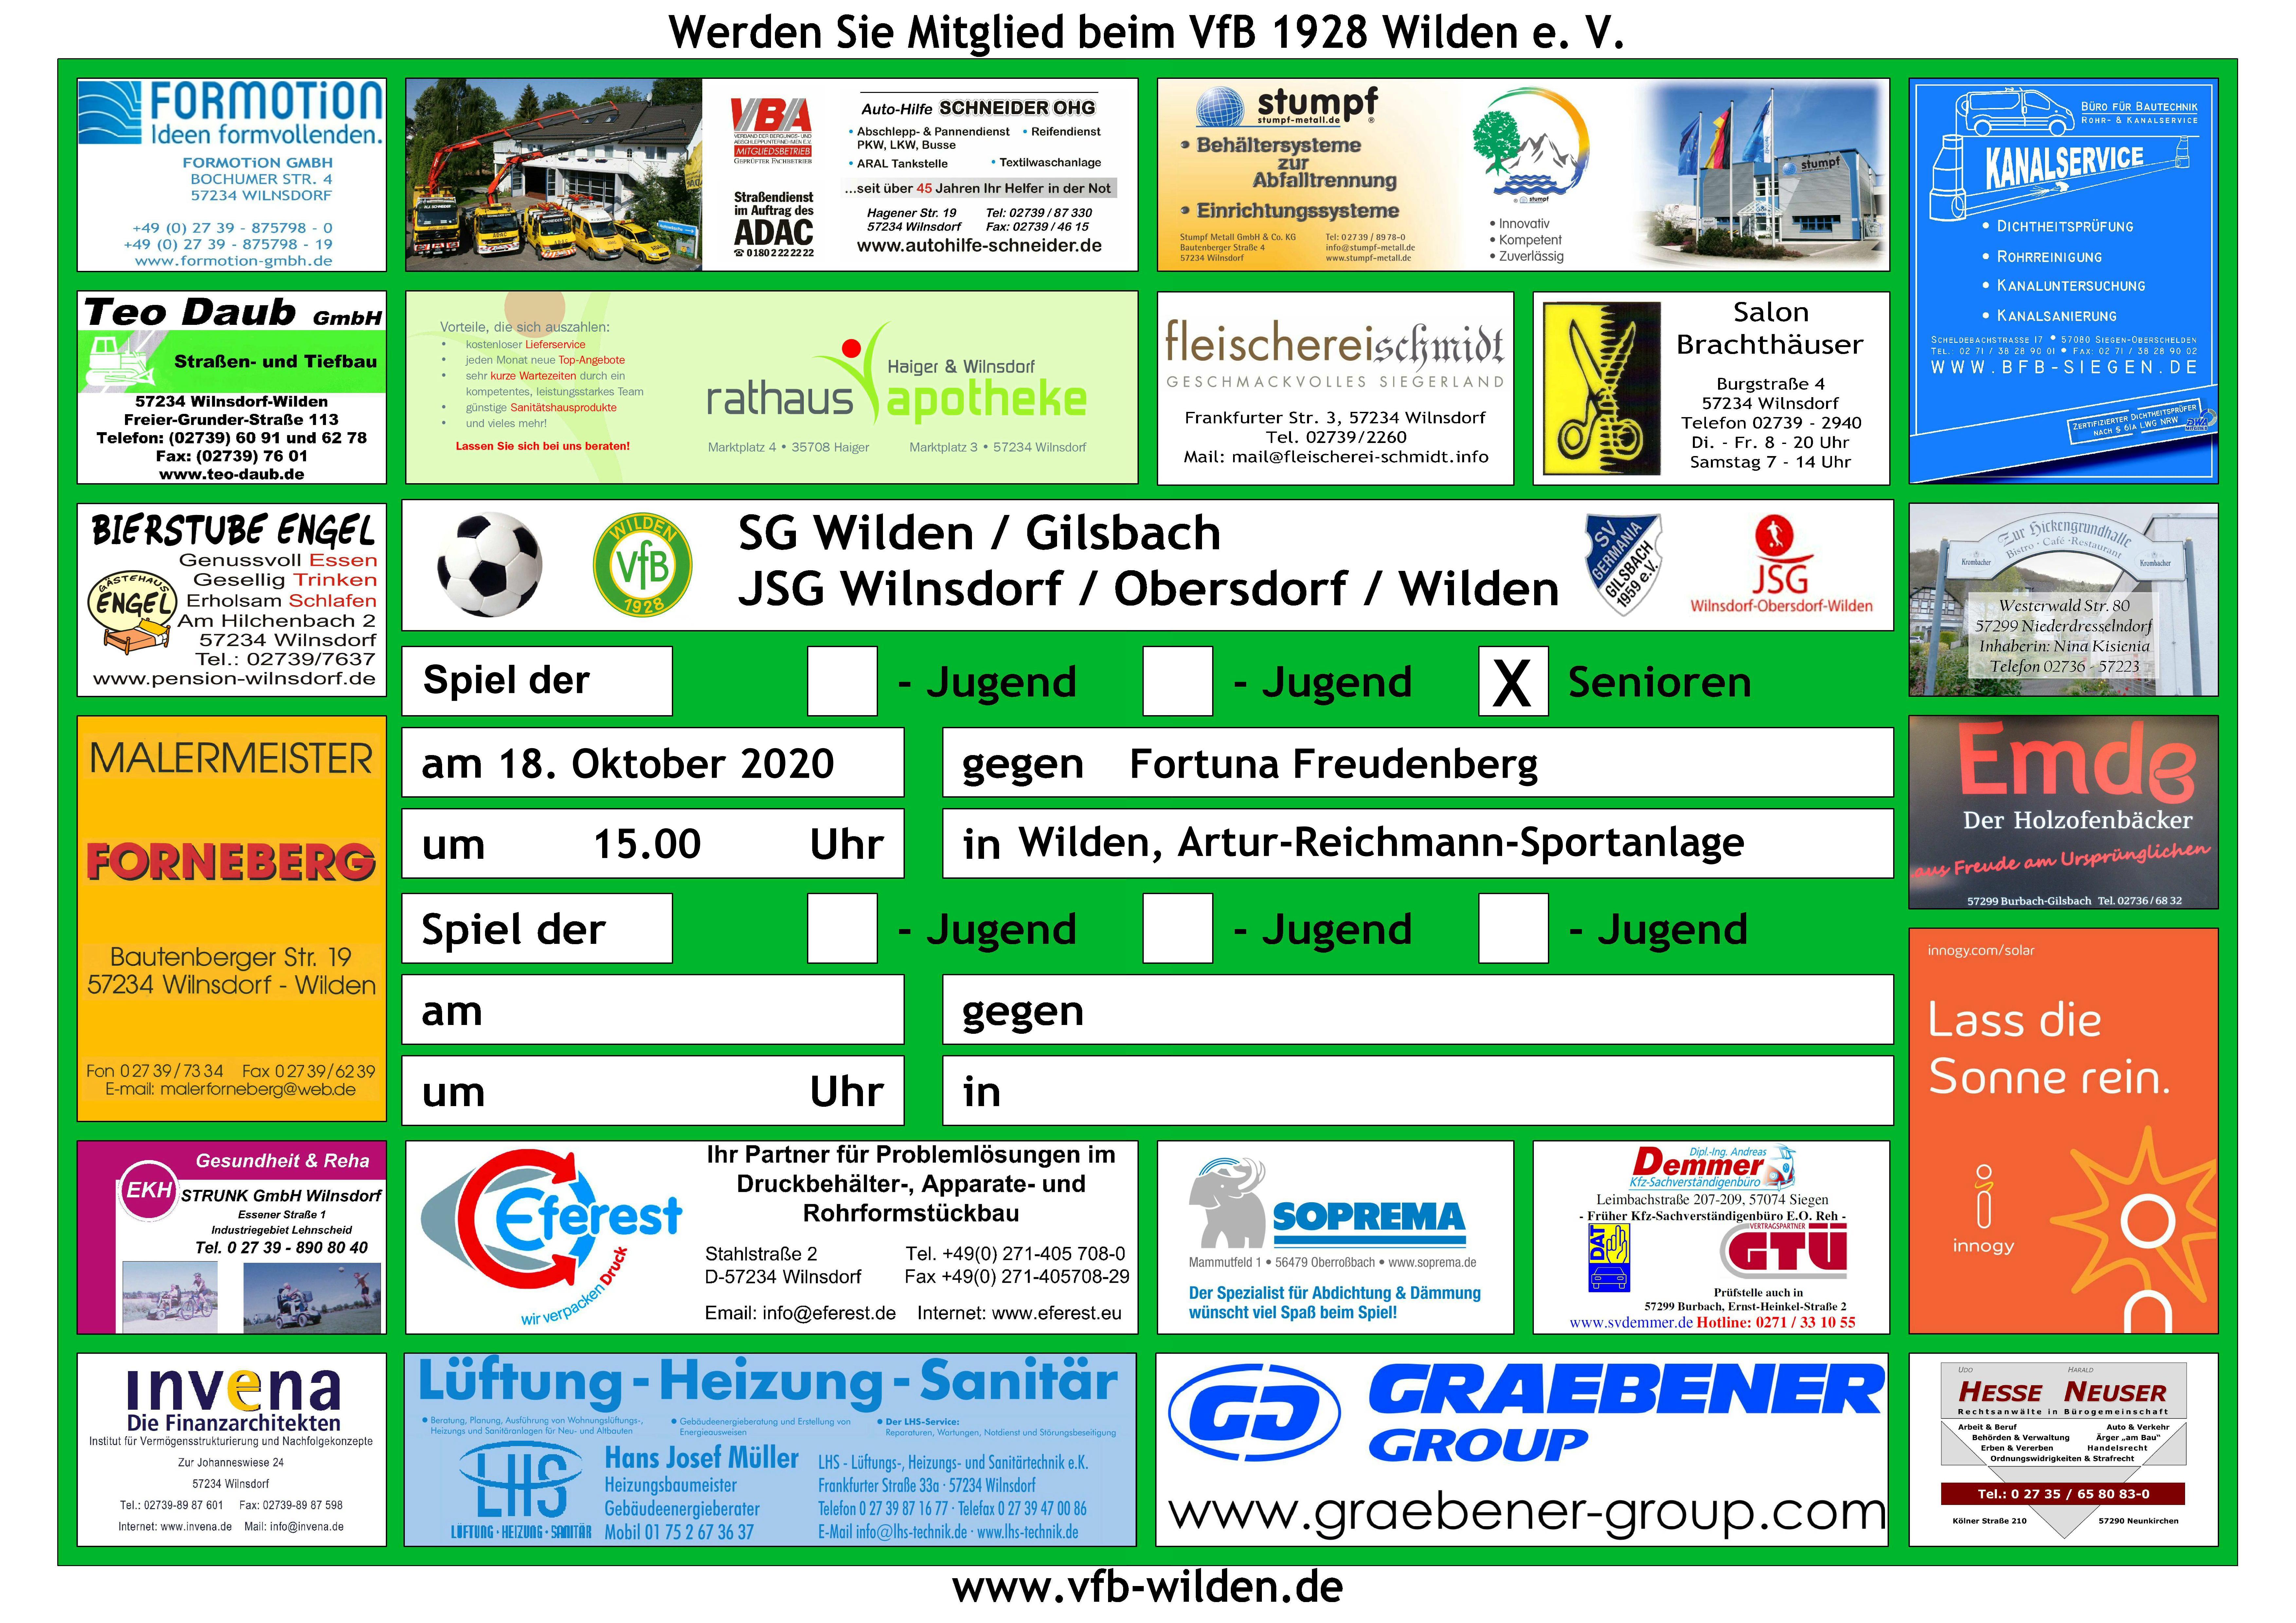 Sonntag 18.10.2020 15.00 Uhr SG Wilden/Gilsbach – SV Fortuna Freudenberg III